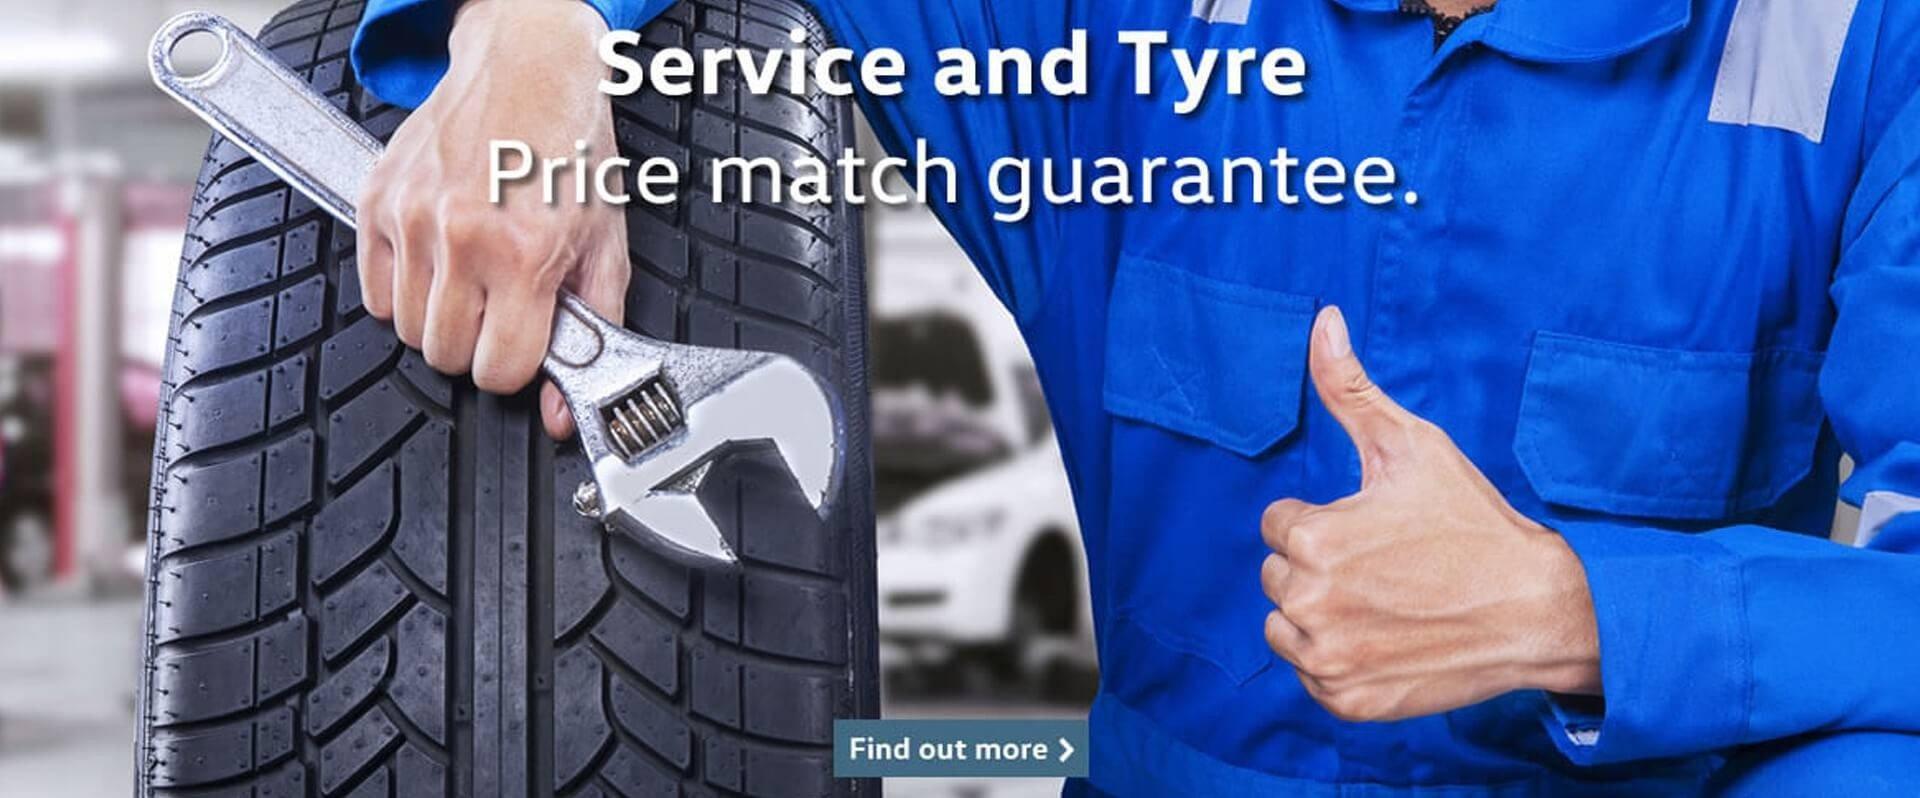 McCarrols Service Tyre Guarantee